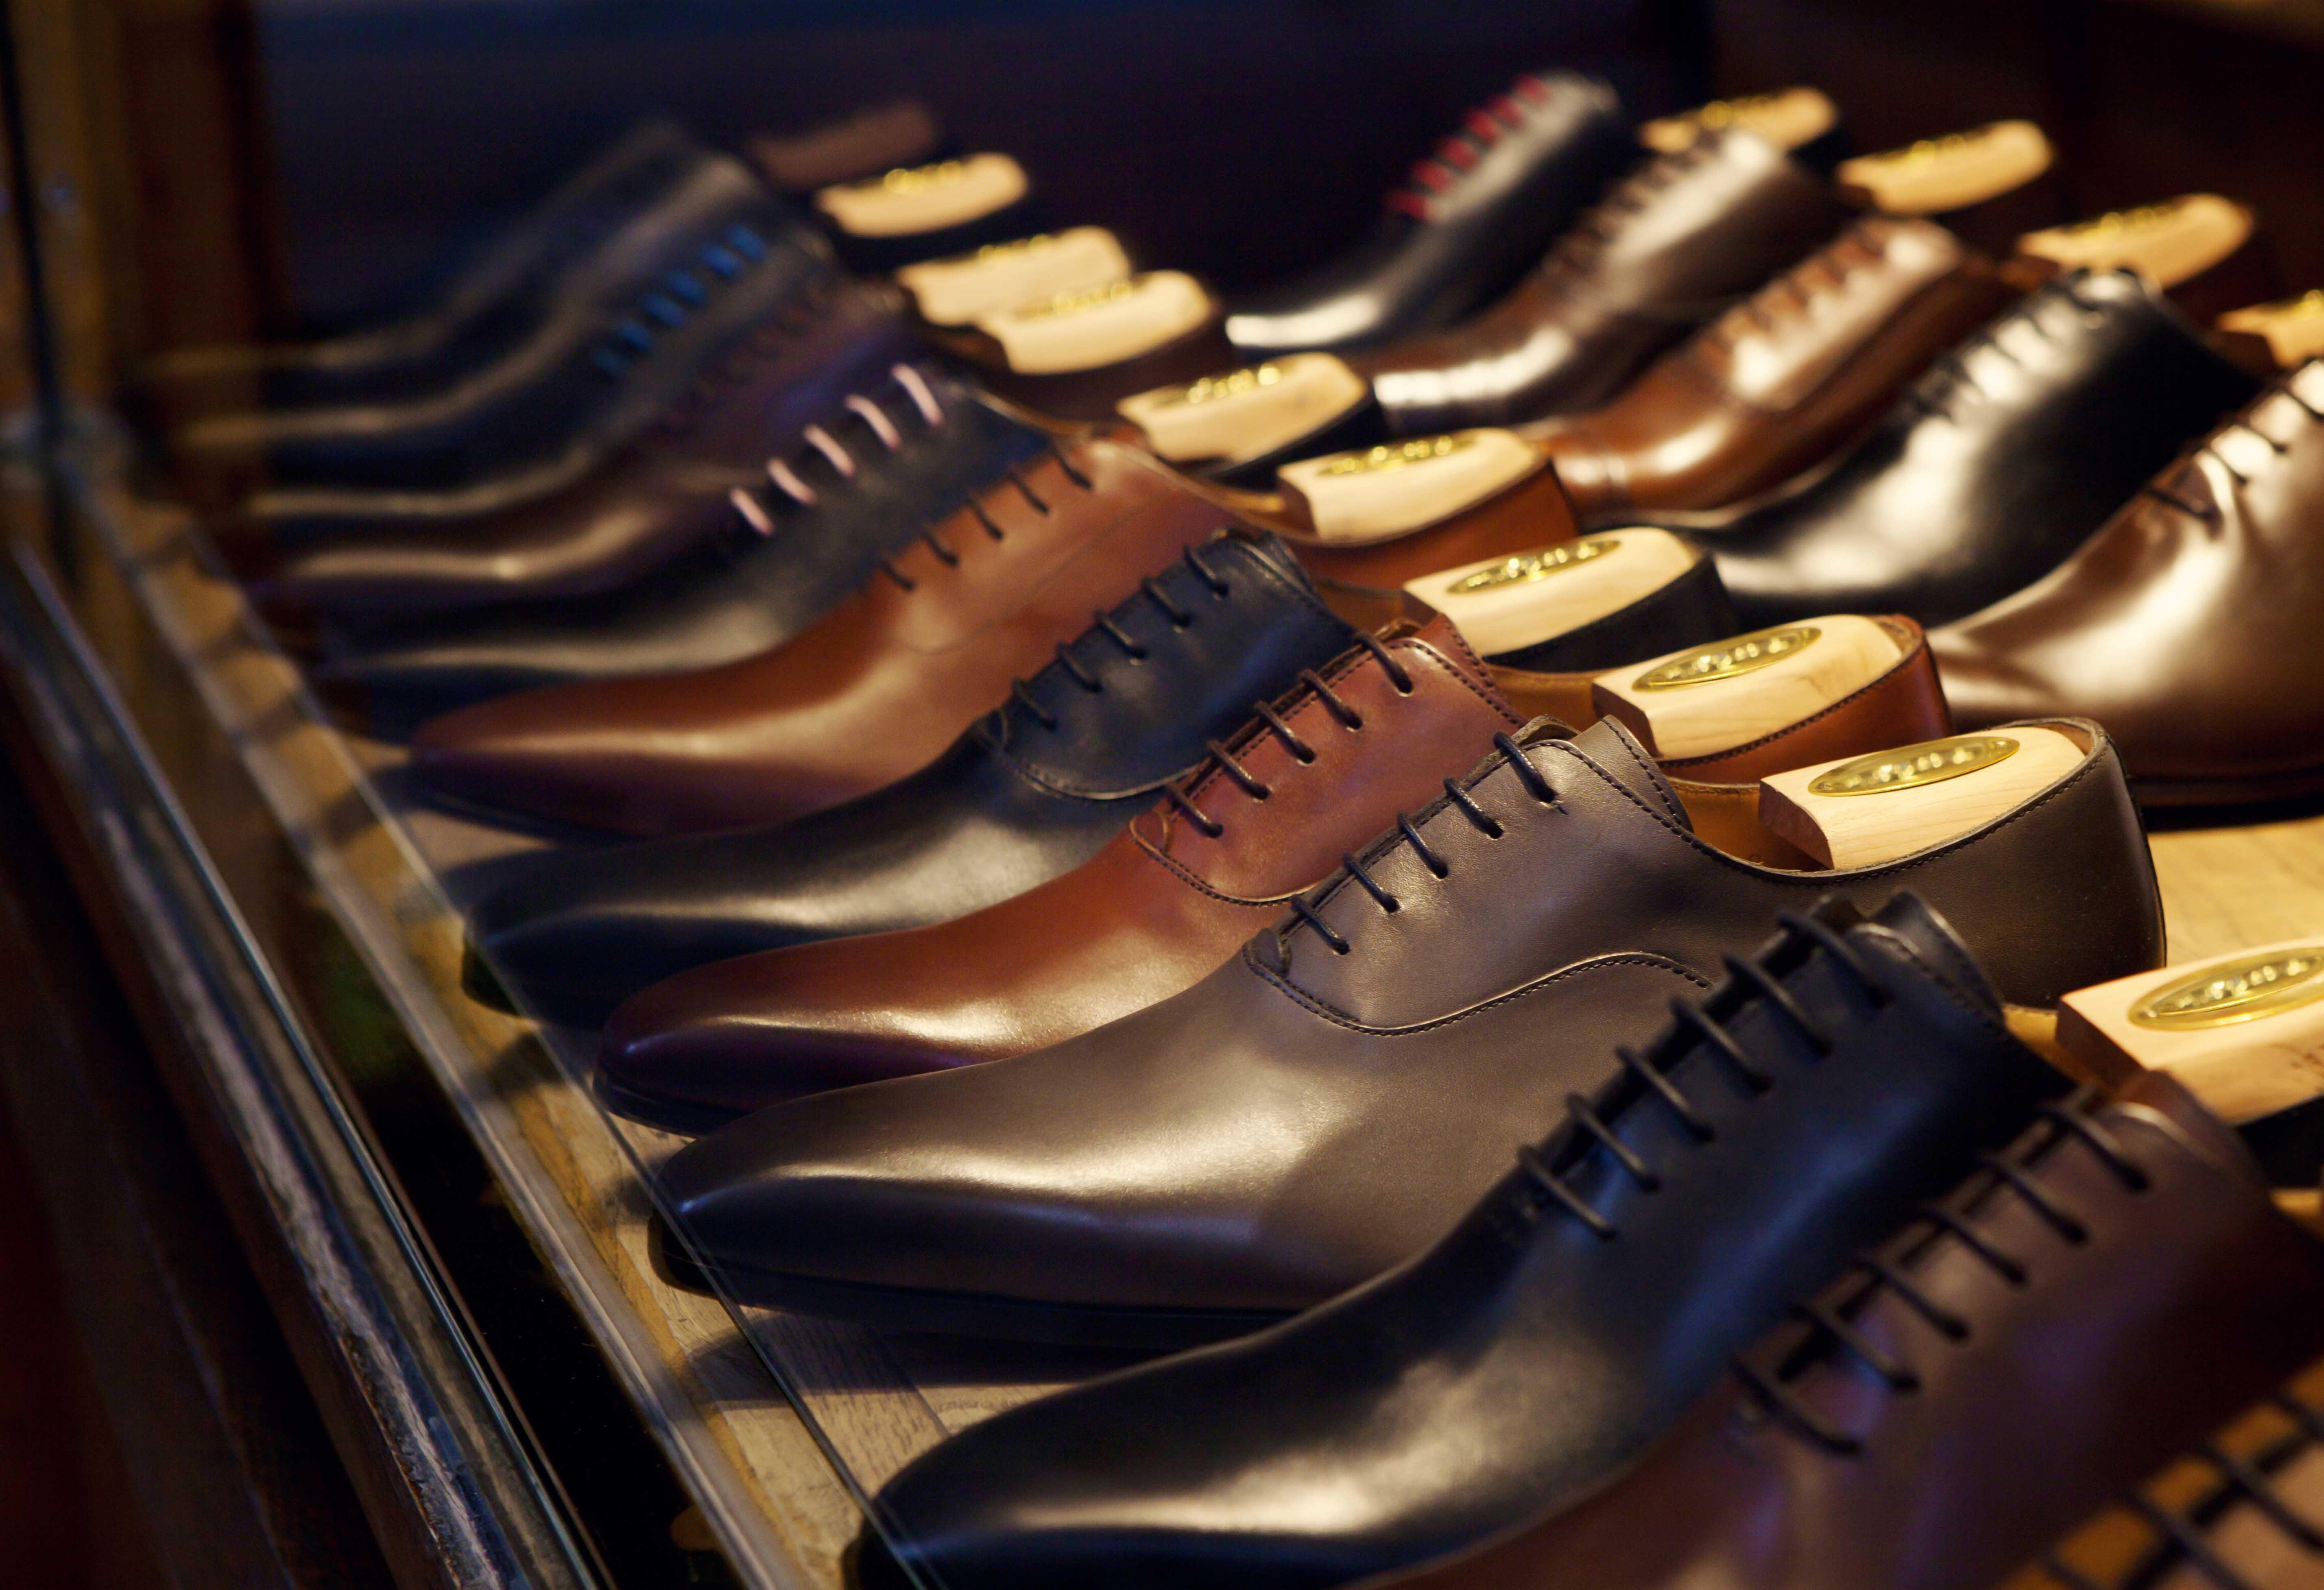 Questione di business… shoe-business